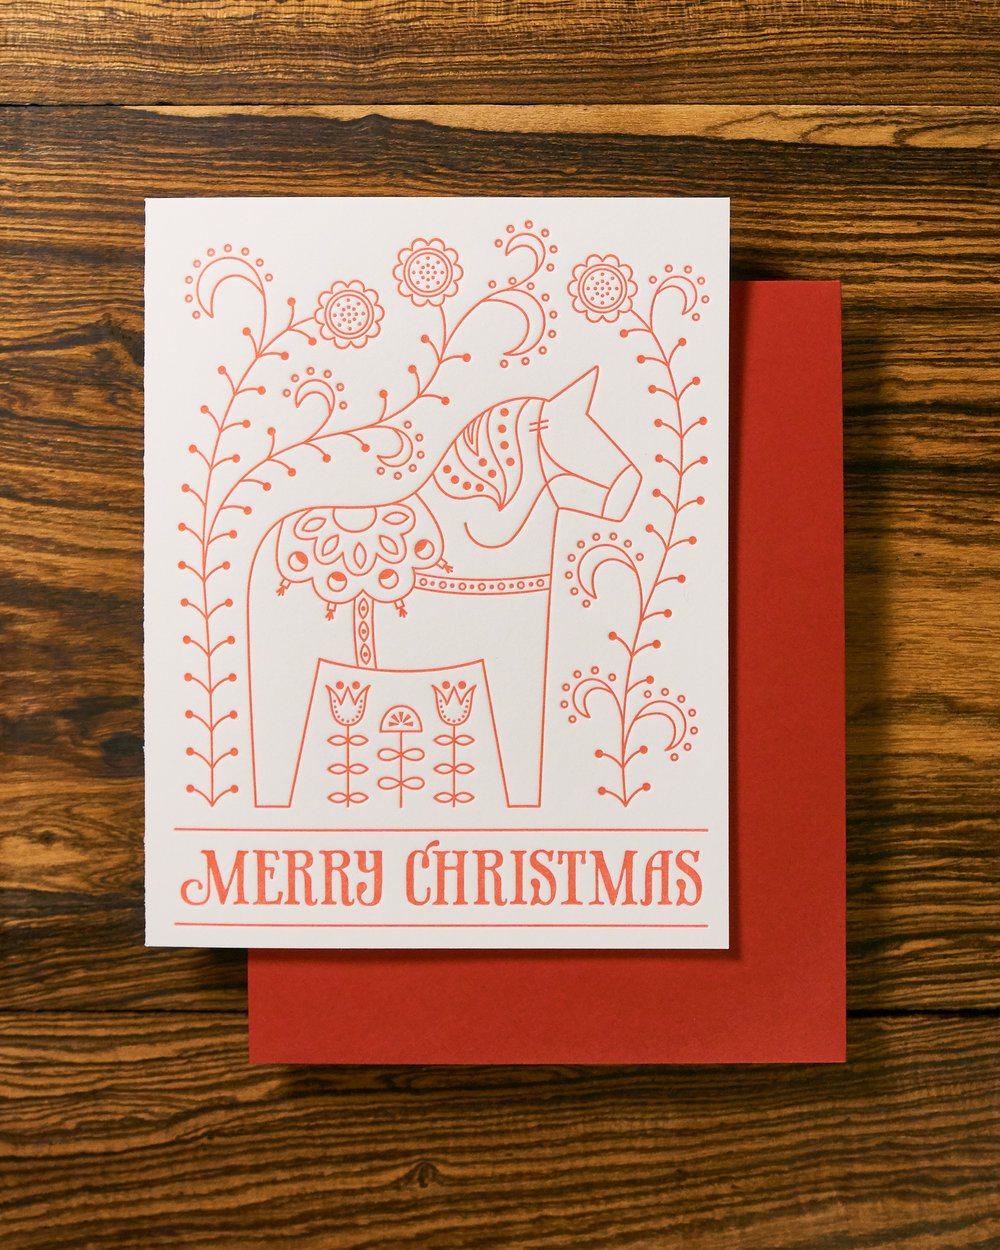 Letterpress Greeting Cards   Letterpress Cards   Wedding Invitations ...